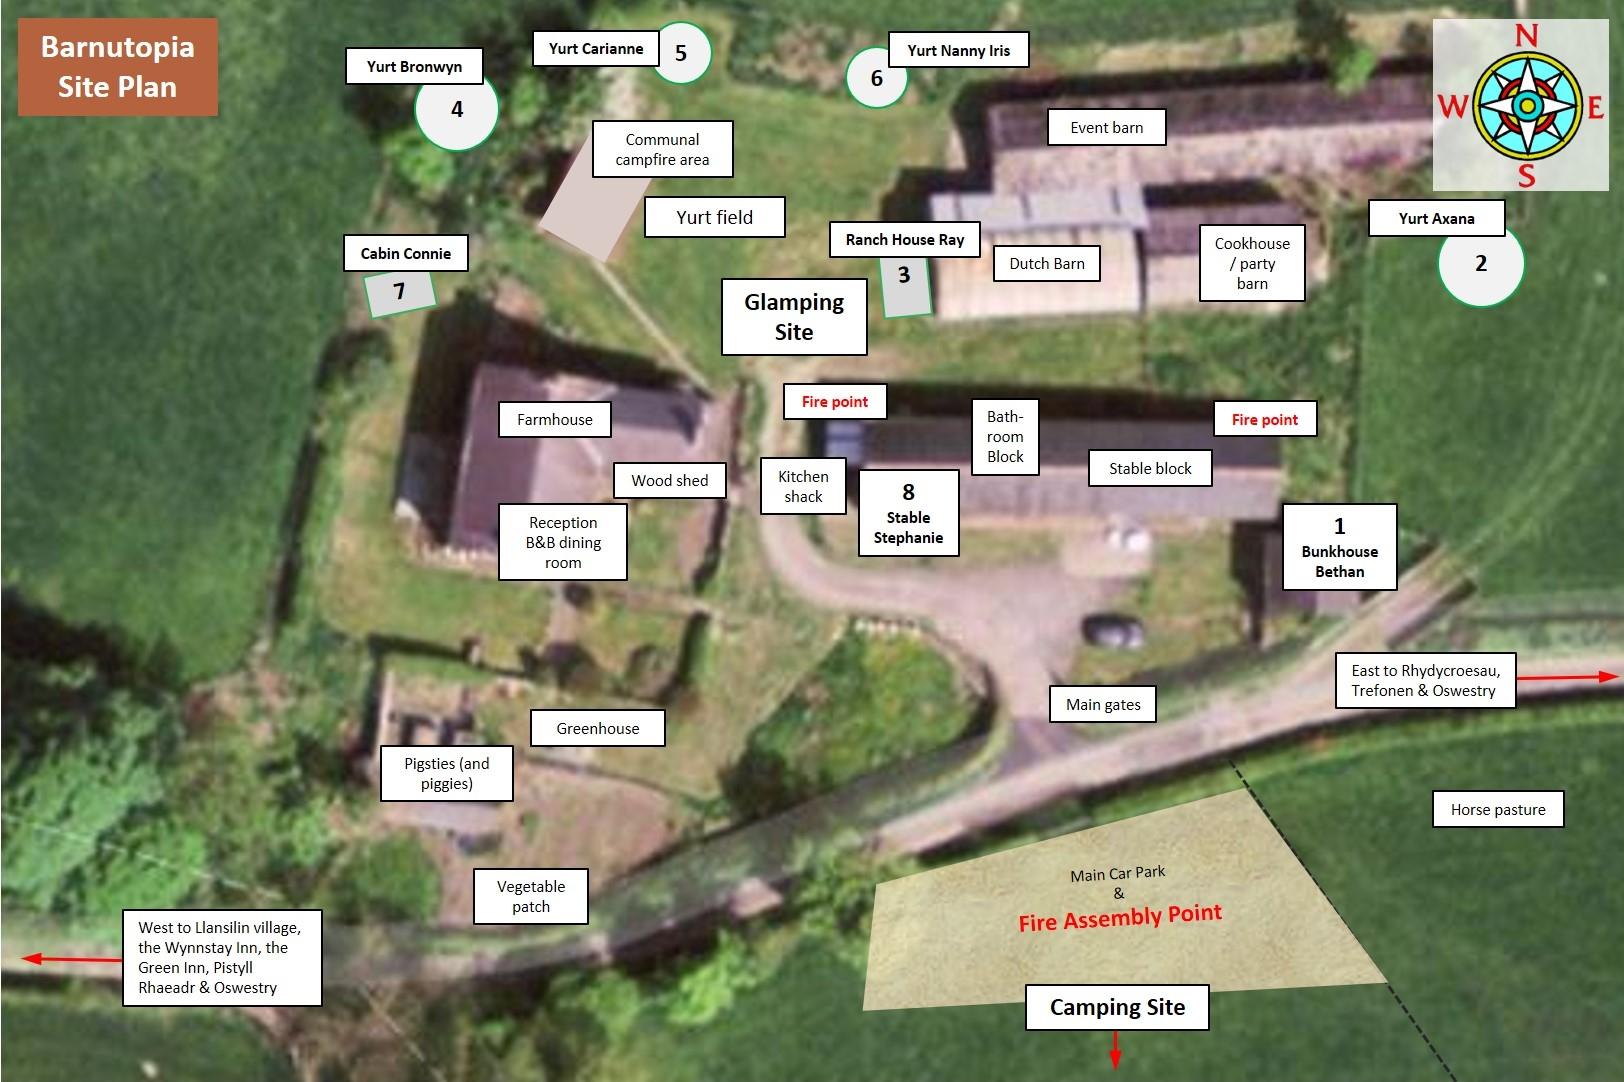 Barnutopia Site Plan